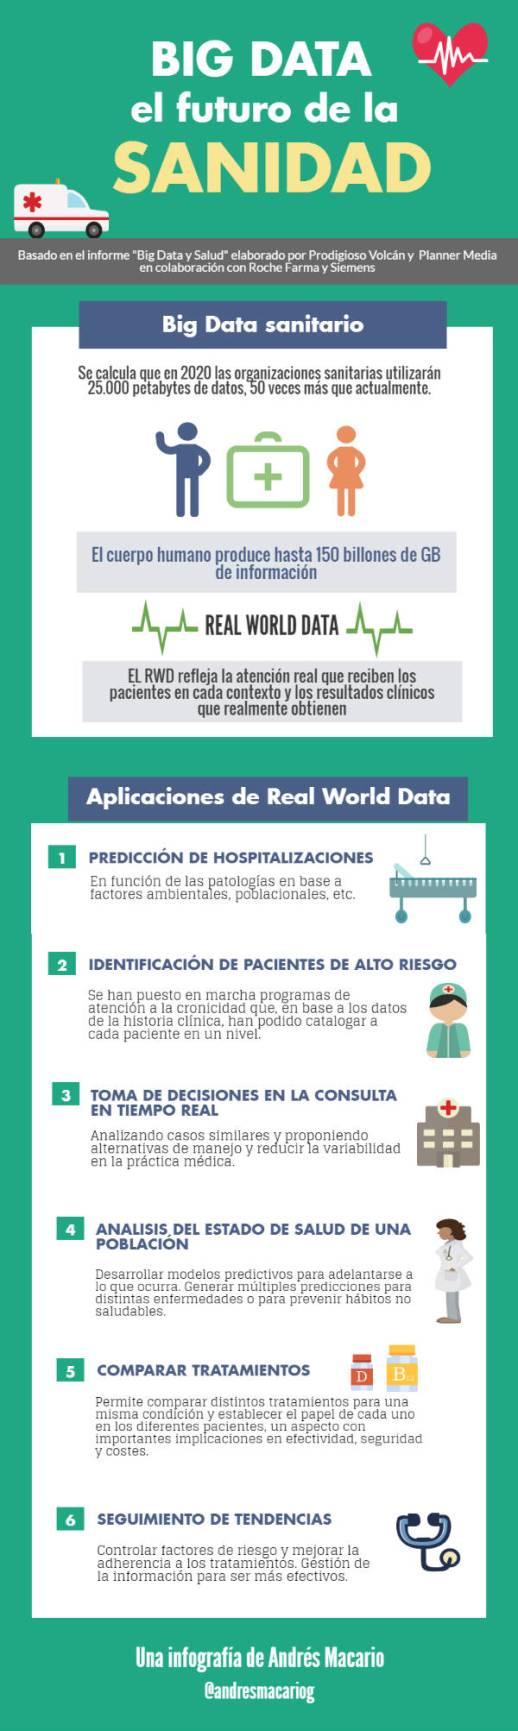 Big-Data-futuro-de-la-sanidad-Infografia-Andres-Macario